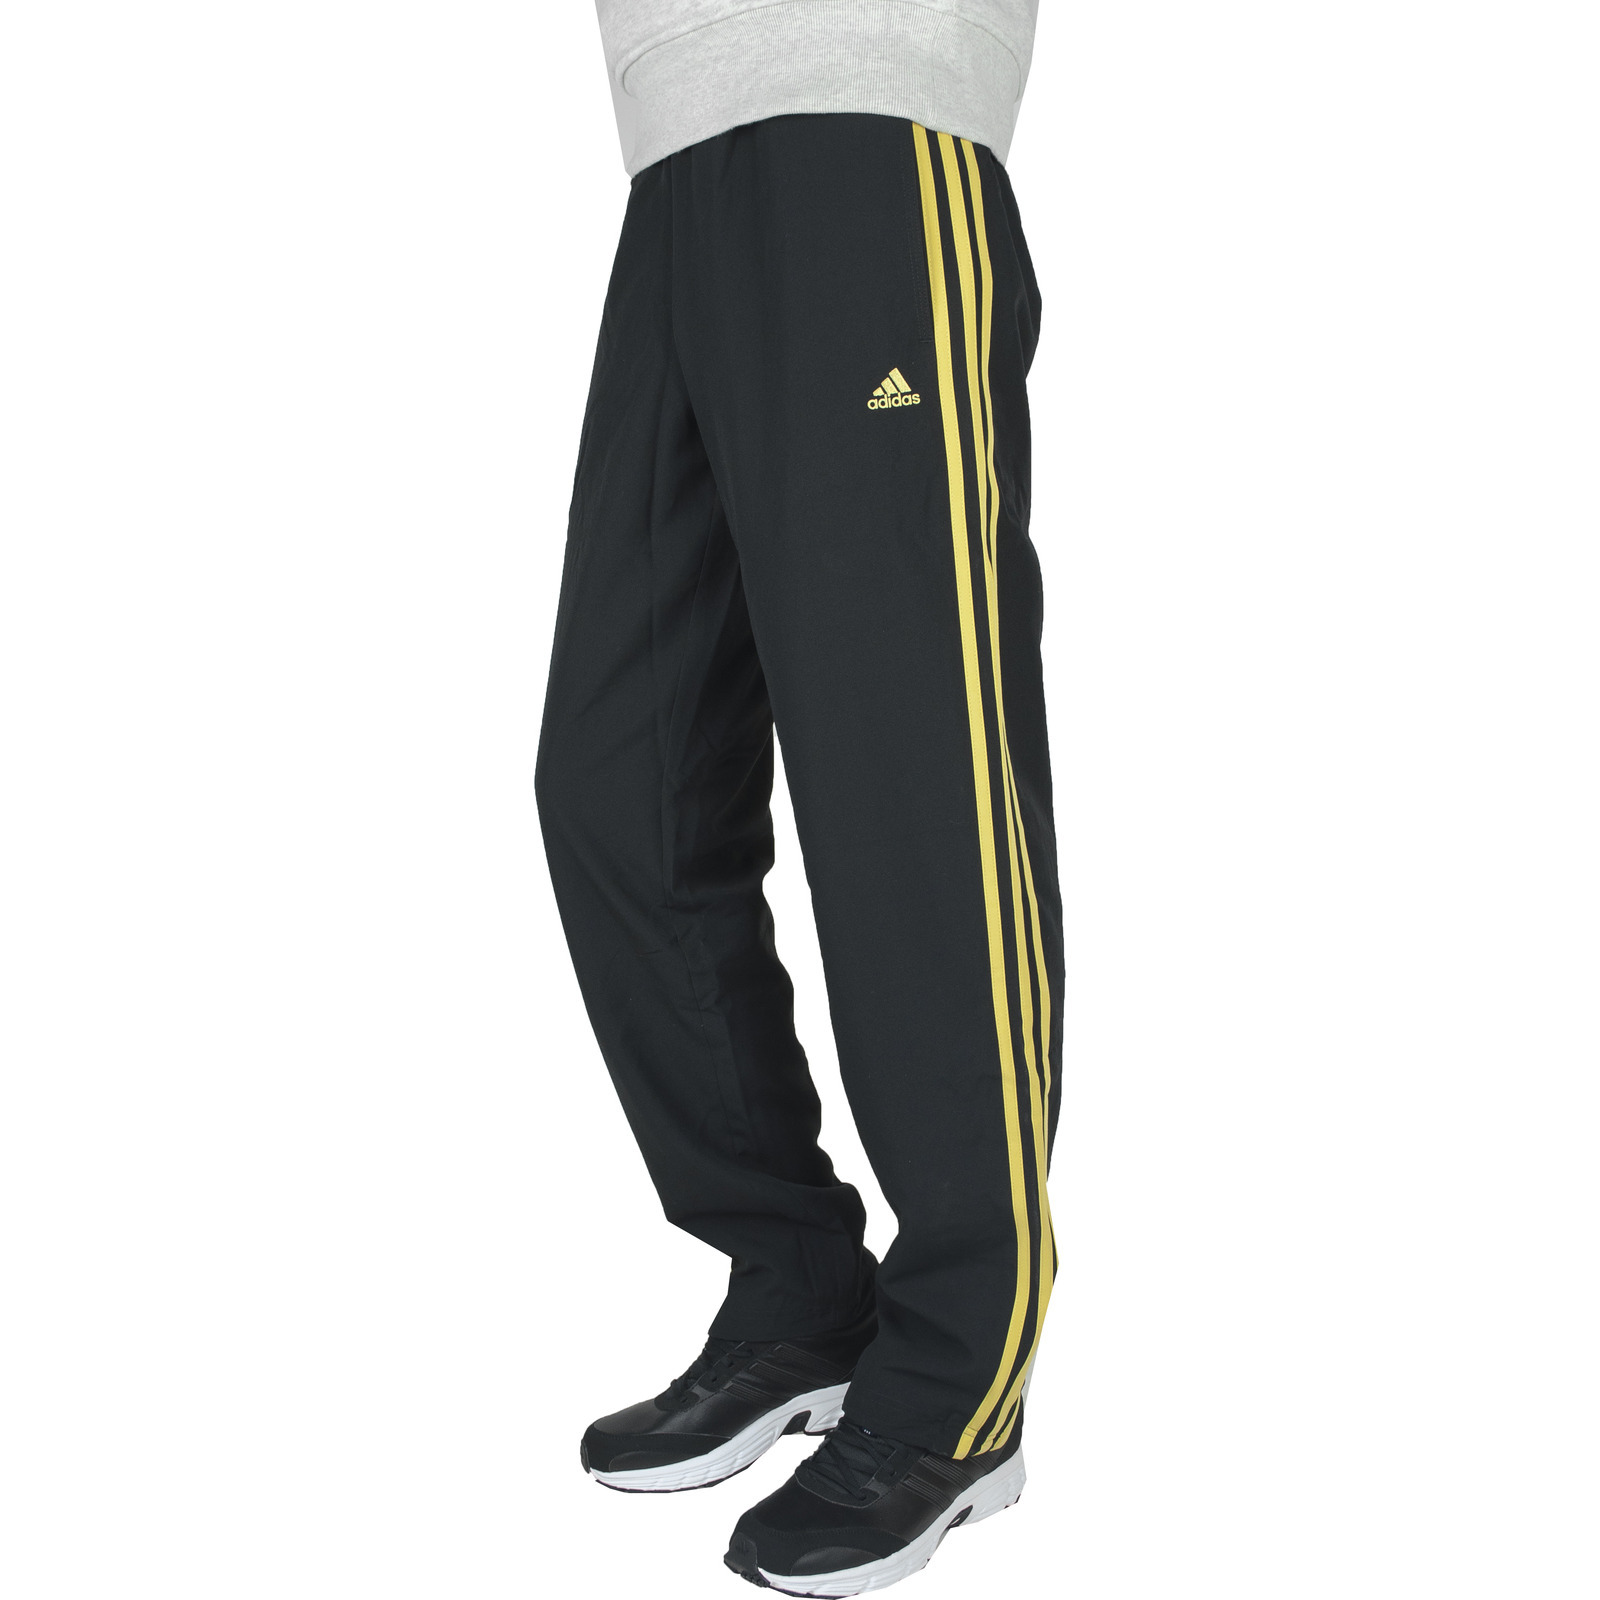 rigidez Es Incomodidad  Pantaloni barbati adidas Ess 3S WV PT Oh X12319